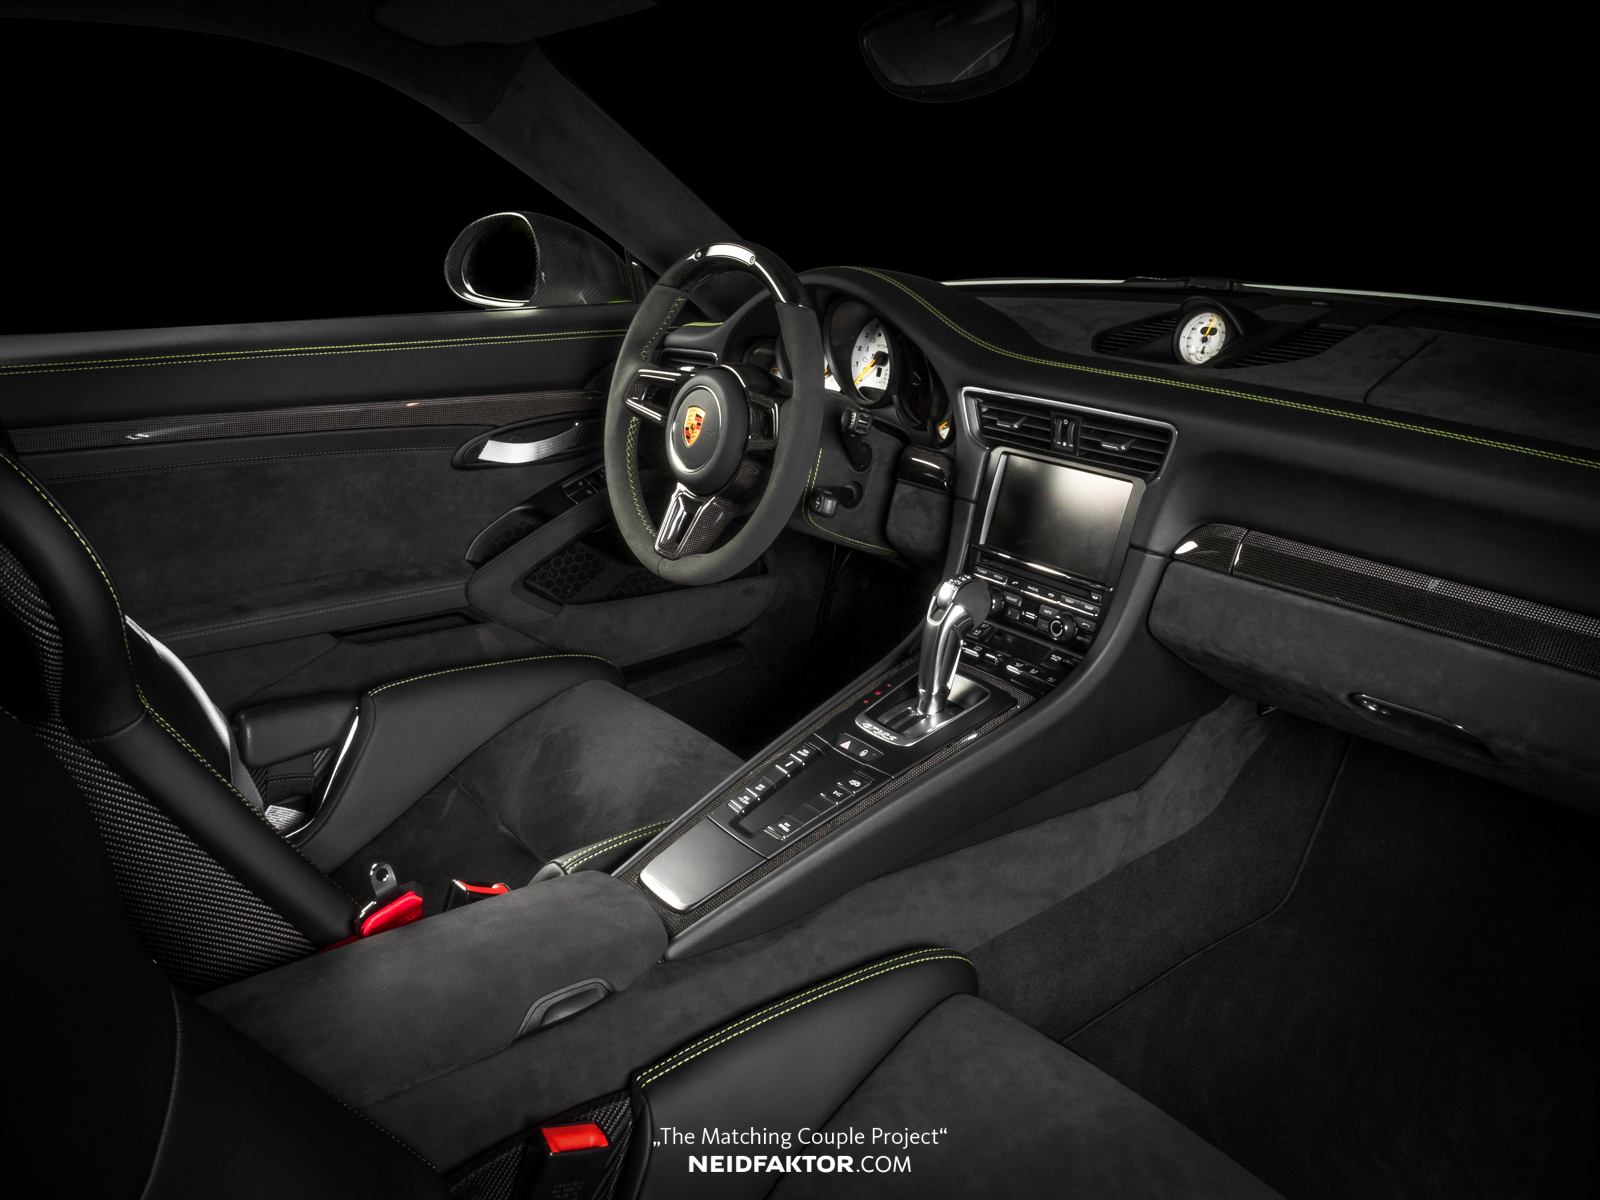 porsche 911 gt3 rs alcantara interior is the most luxurious ever